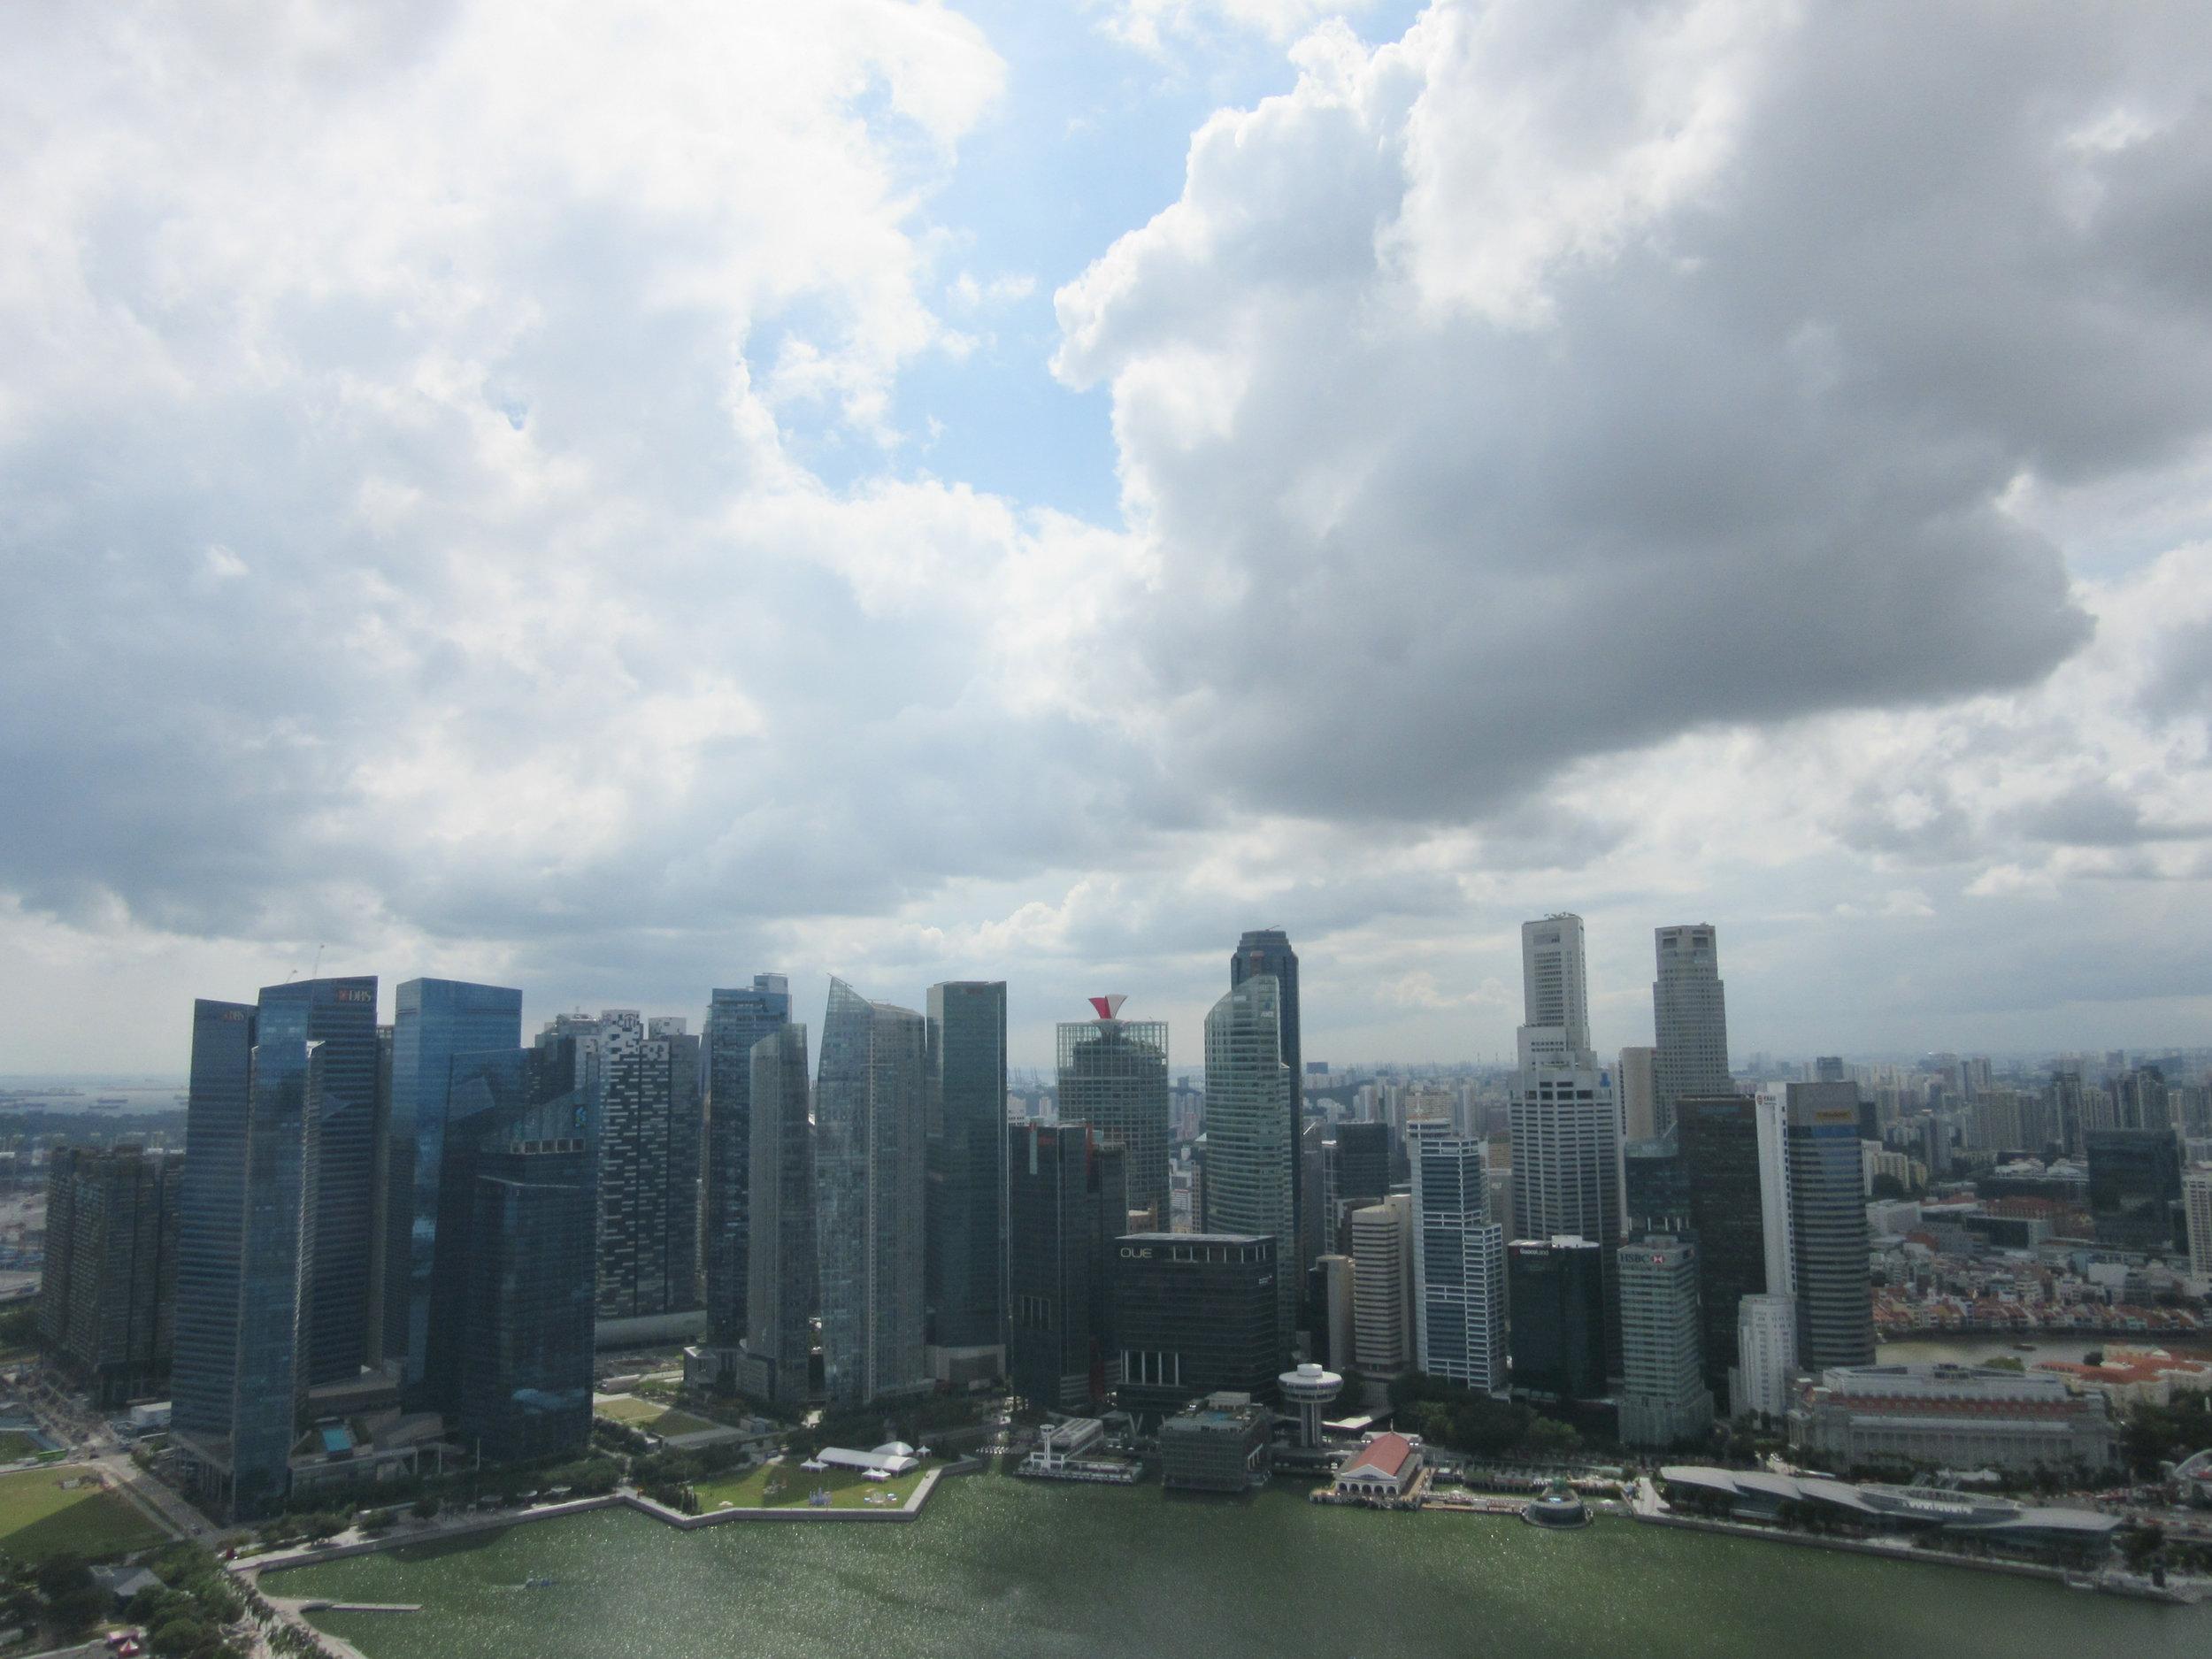 Singapore skyline seen from Marina Bay Sands